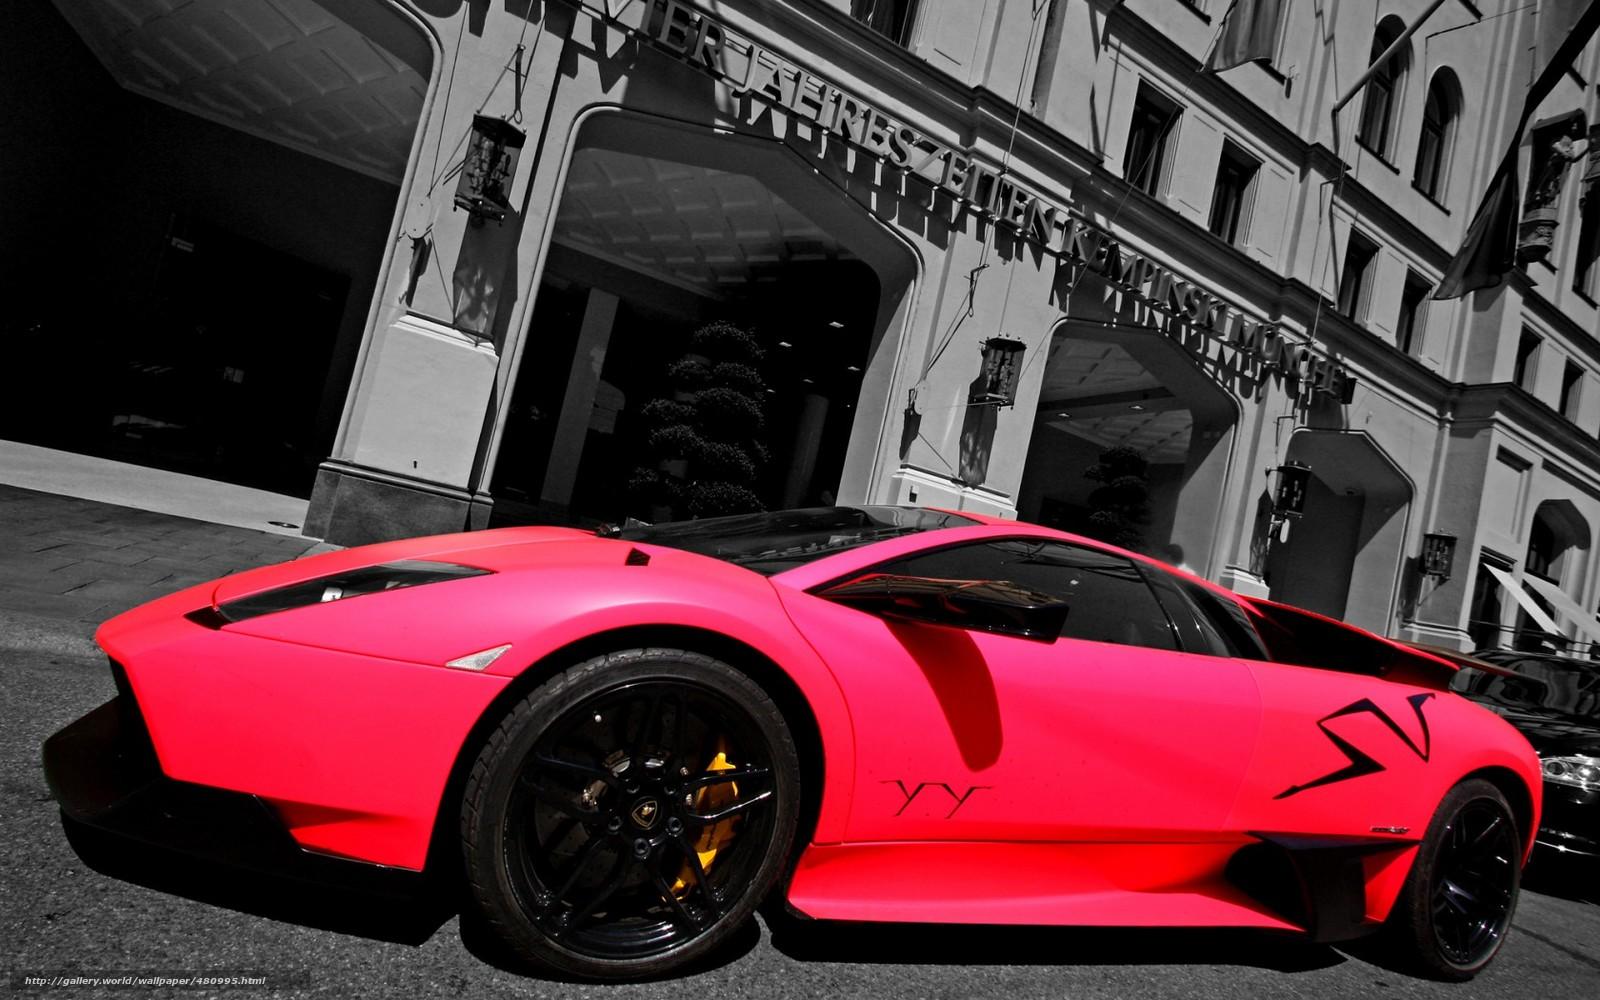 Tlcharger Fond d'ecran Lamborghini, murselago, Supercar, rose Fonds d'ecran gratuits pour votre ...